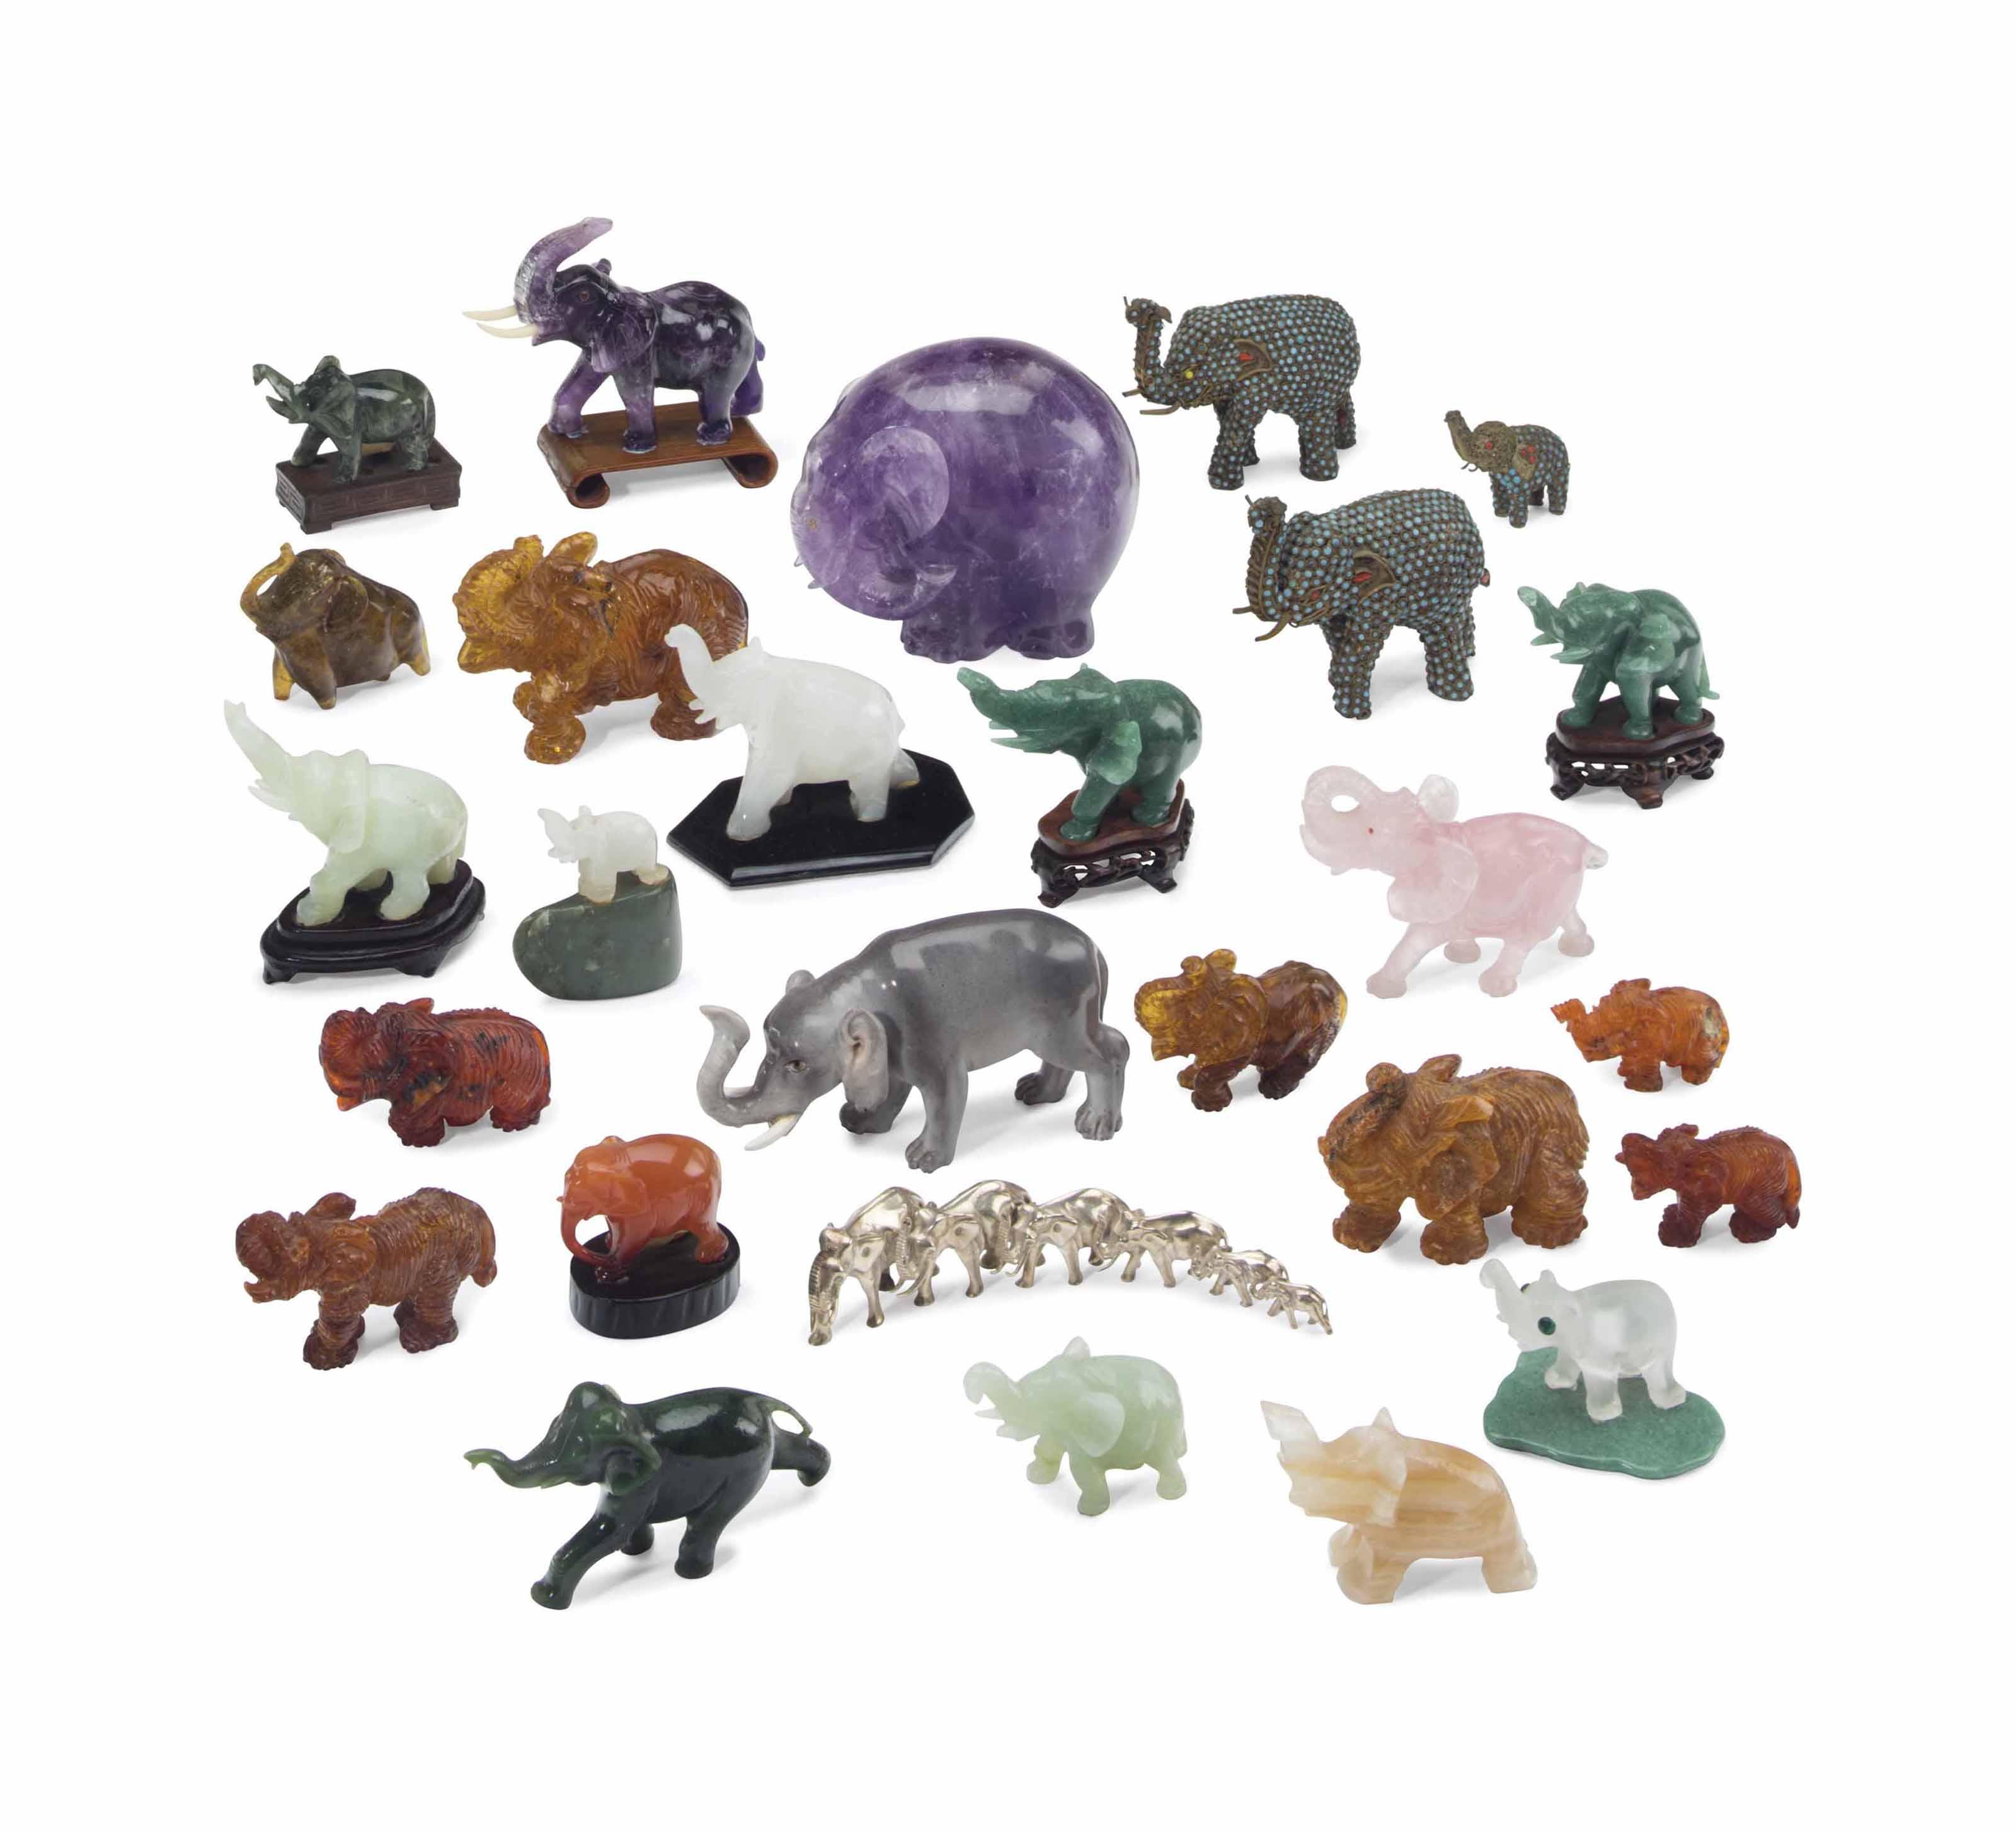 MRS. RONALD REAGAN A COLLECTION OF TWENTY-SEVEN MODELS OF ELEPHANTS